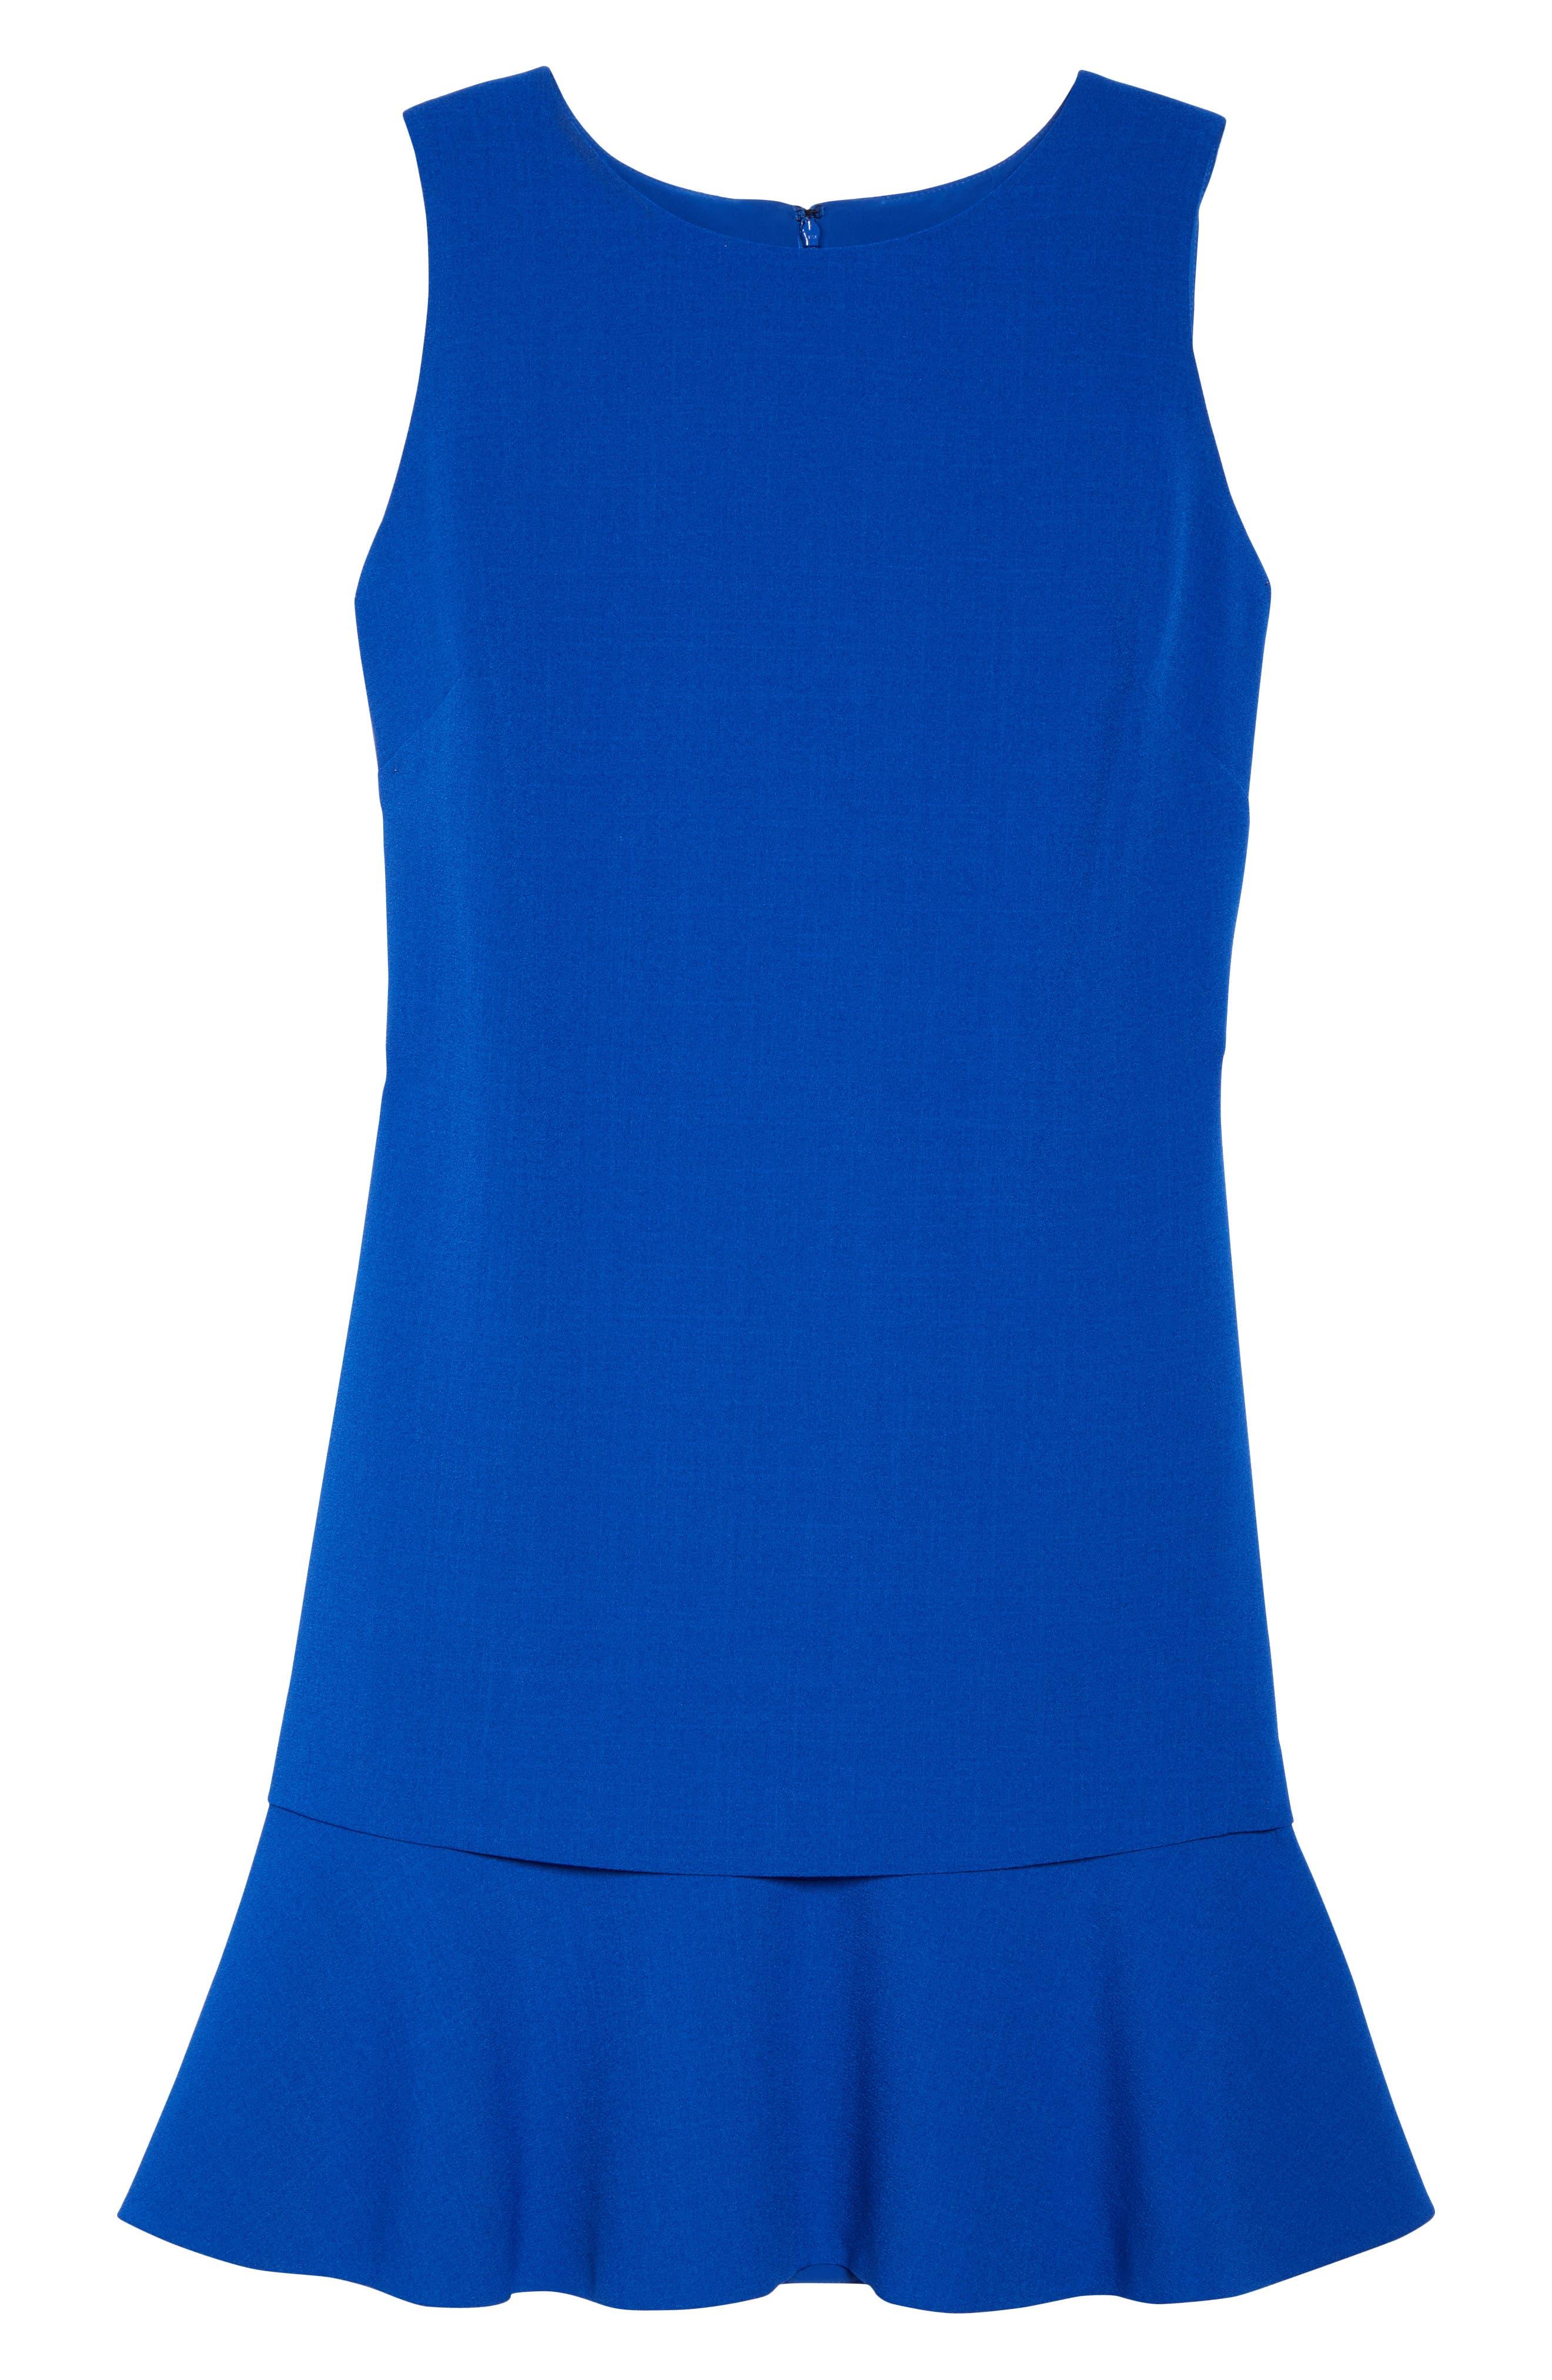 Tiered Drop Waist A-Line Dress,                             Alternate thumbnail 6, color,                             432